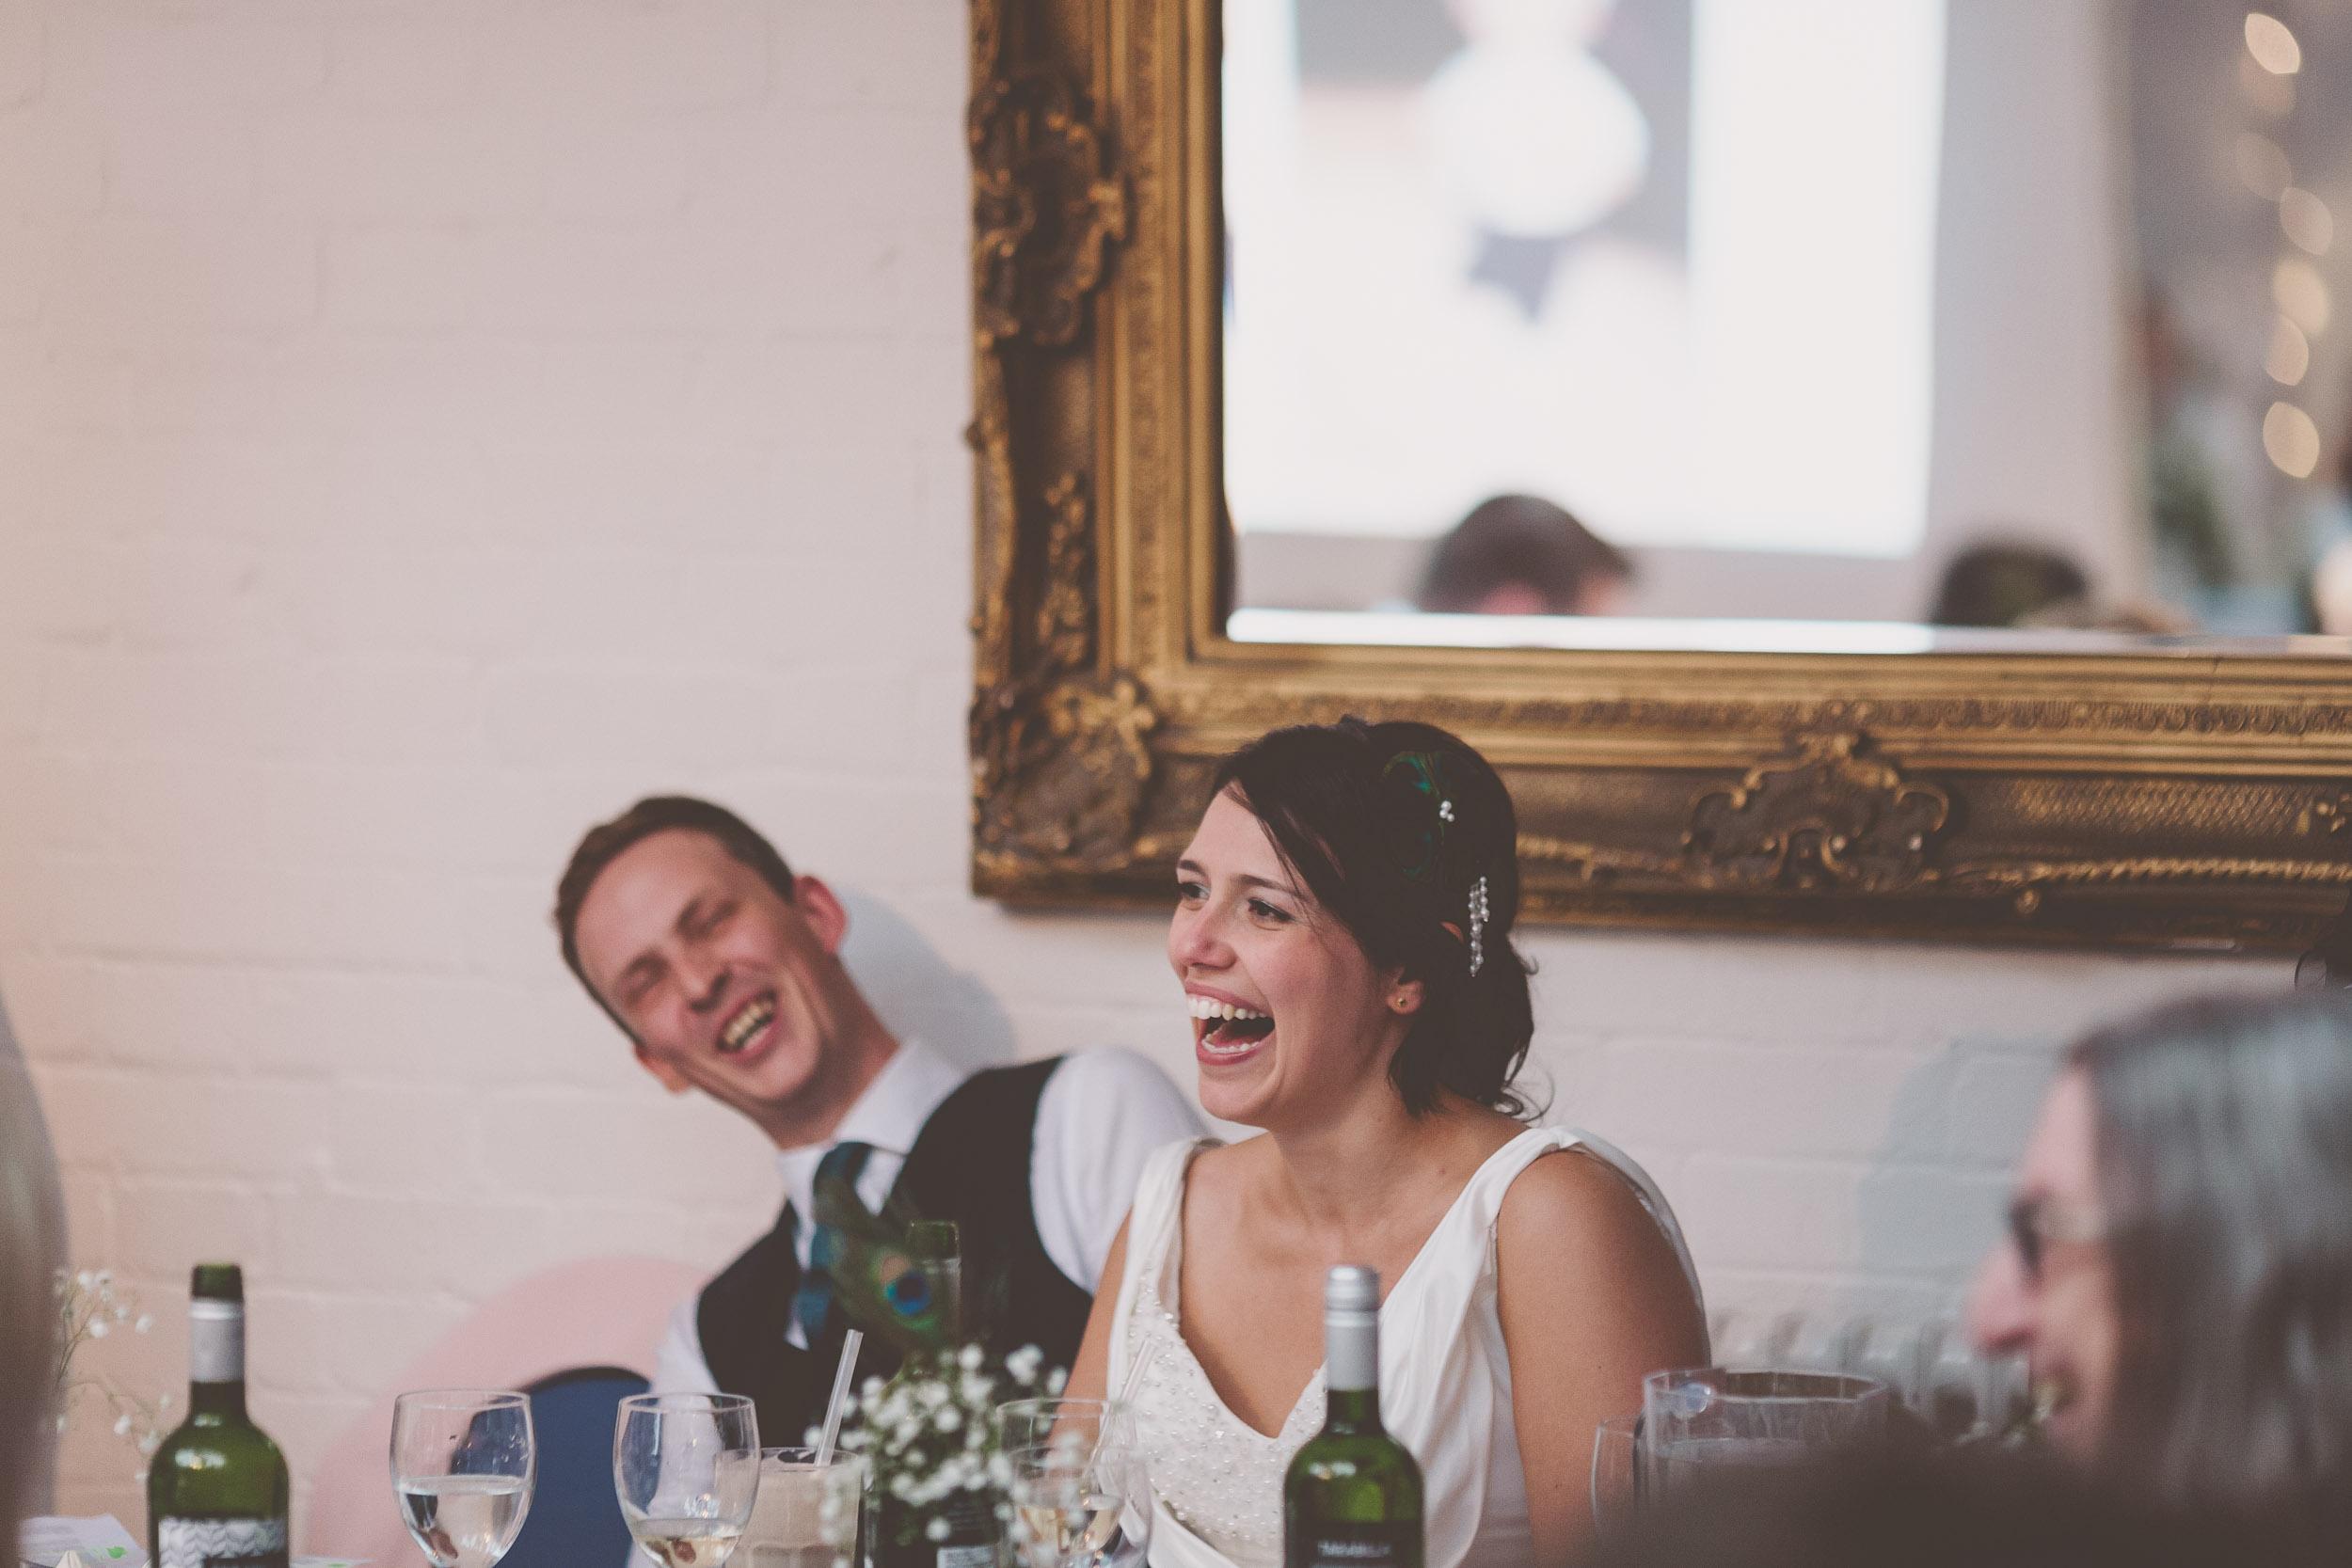 islington-town-hall-4th-floor-studios-wedding365.jpg